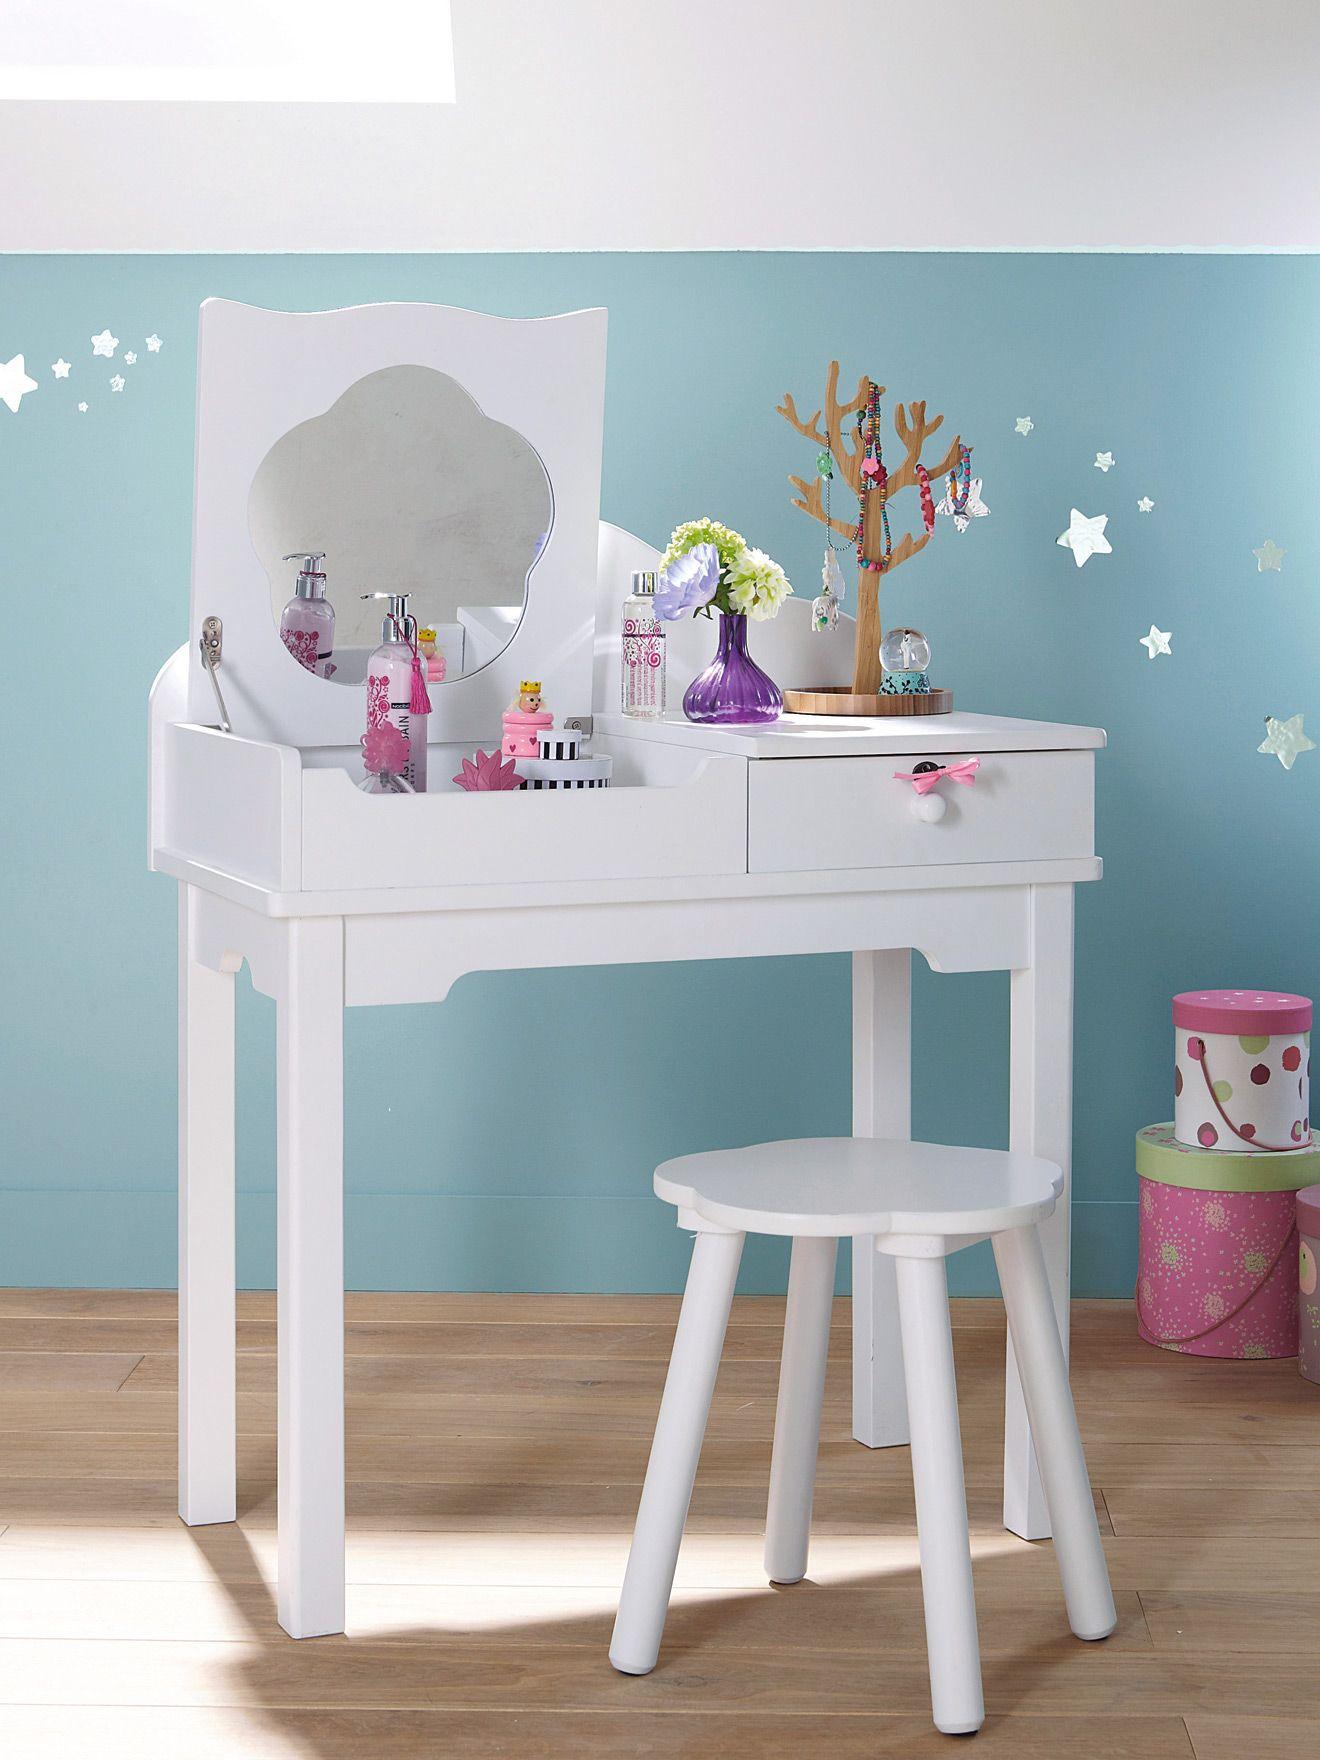 Escritorio tocador para ni a muebles para nenas pinterest tocador tocador peque o y - Muebles para cuarto de nina ...